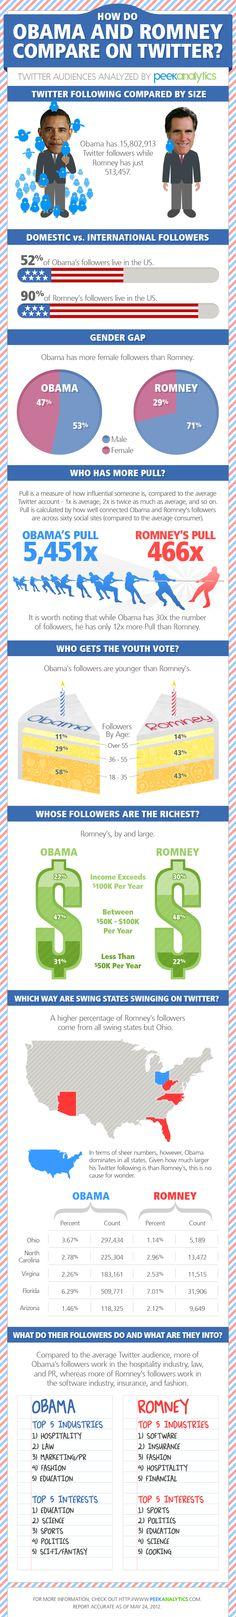 Obama vs Romney on Twitter: How does their social media presence stack up? #SocialMedia #GOP2012 #RNC2012